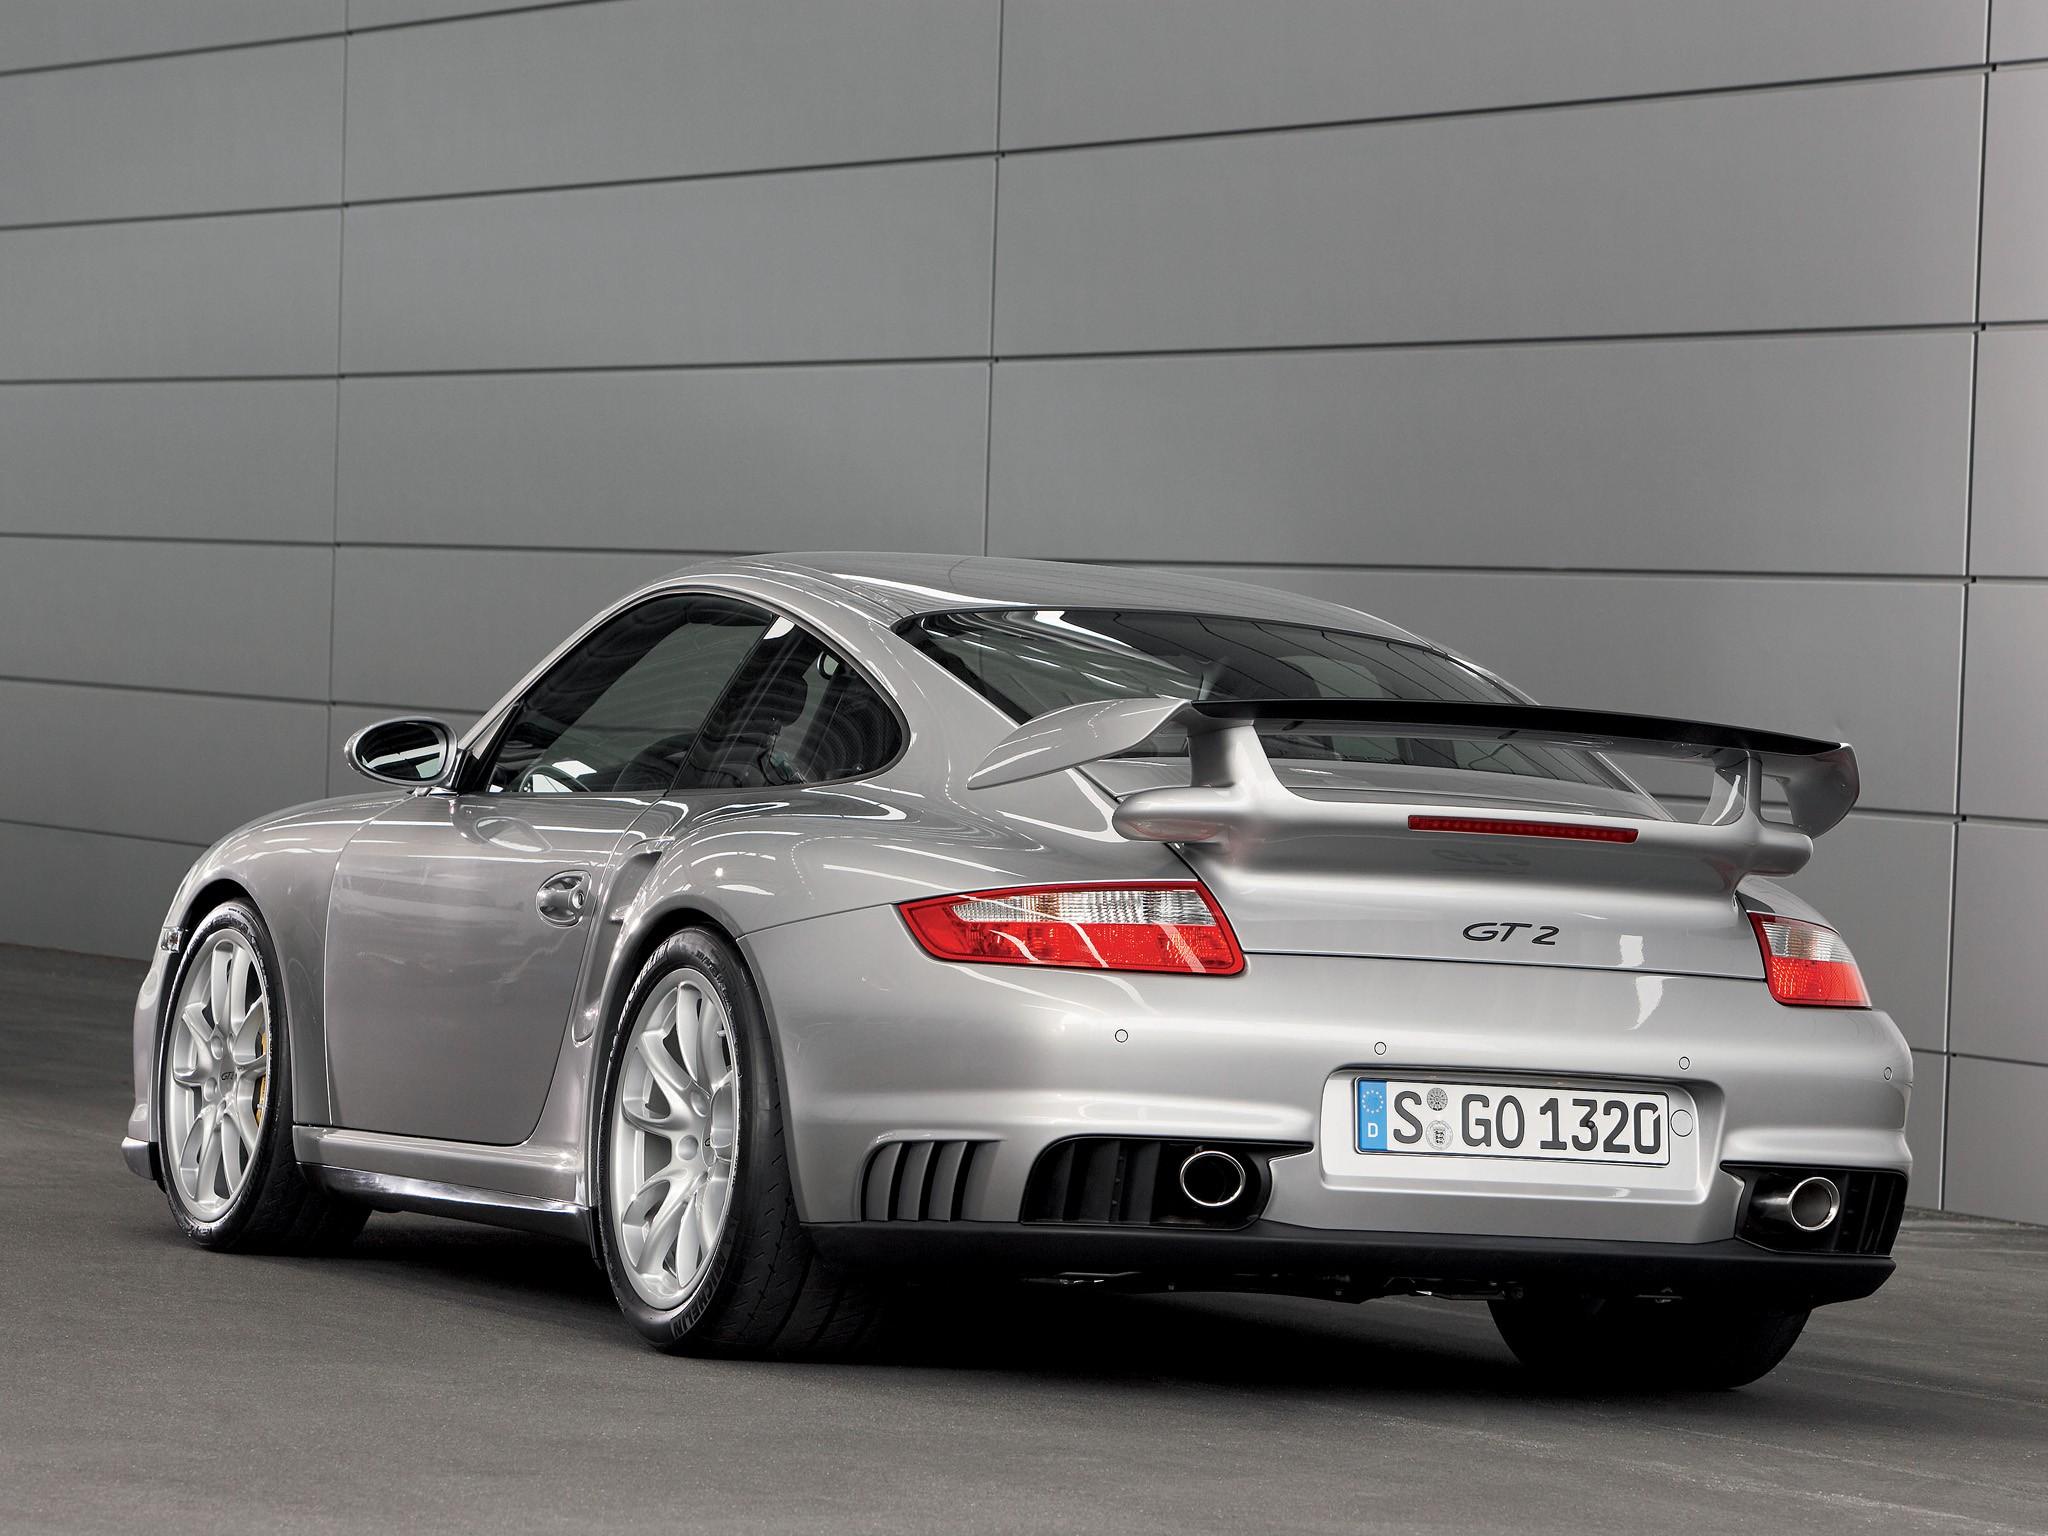 Porsche 911 Gt2 997 2007 2008 2009 Autoevolution